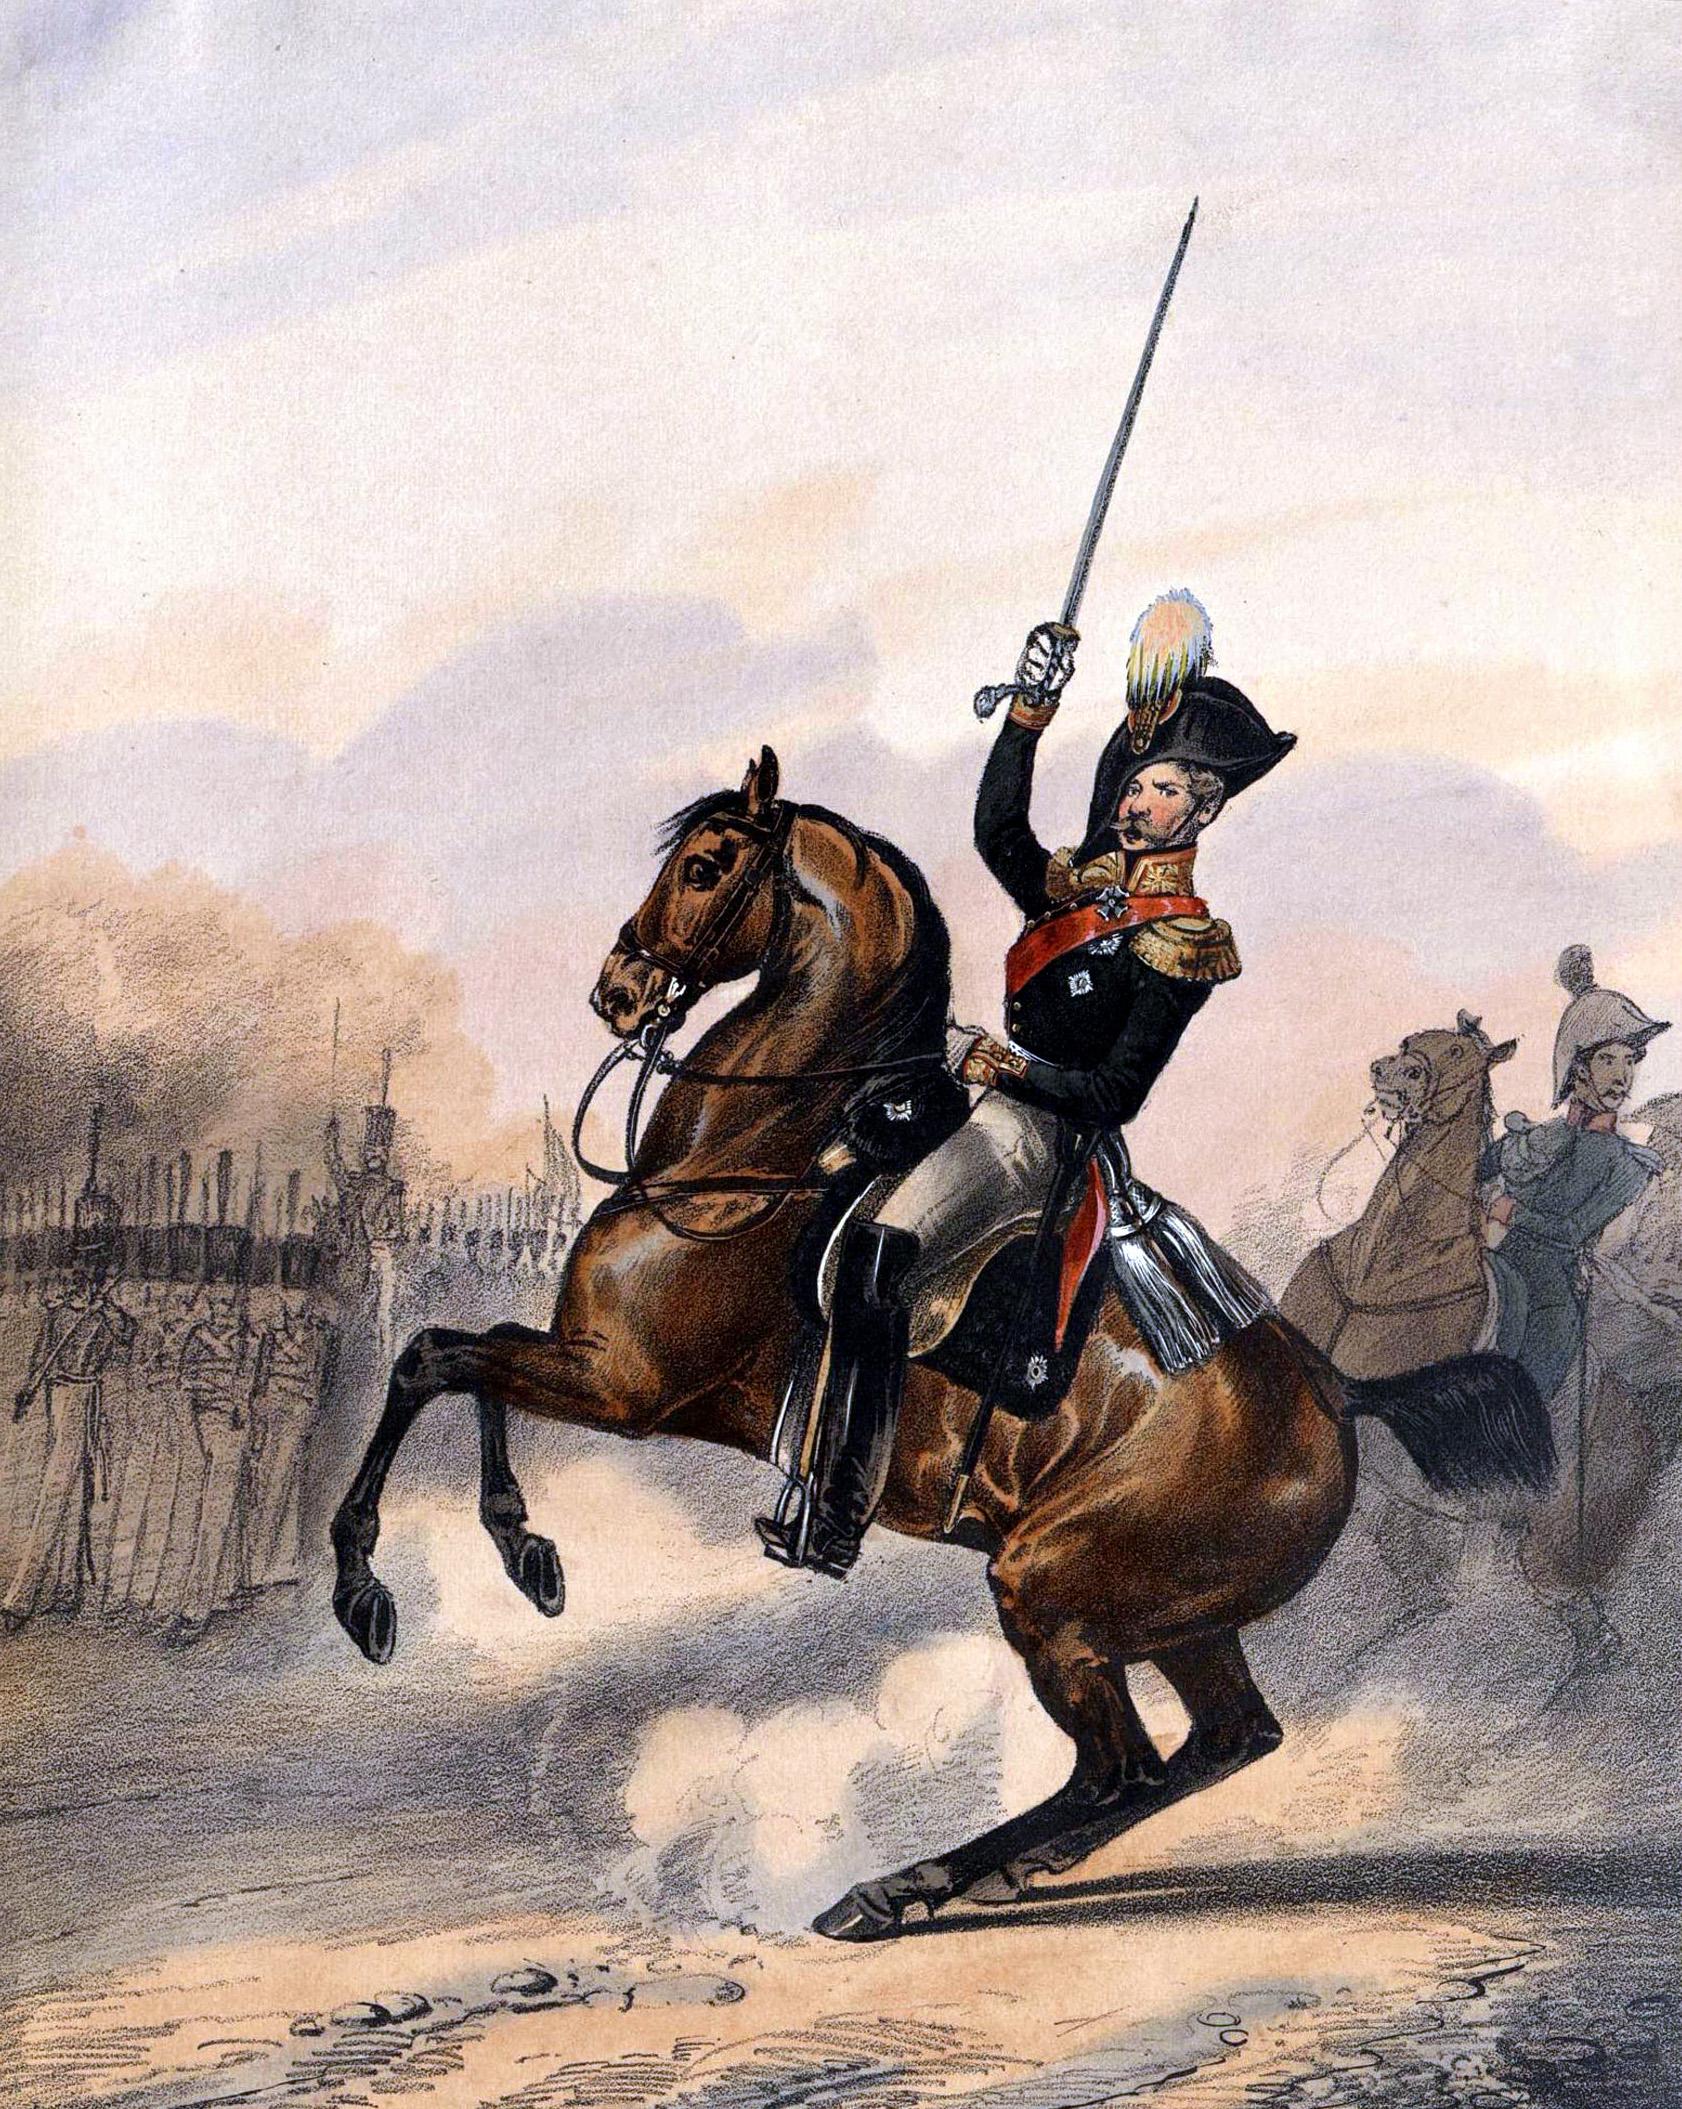 005. Kaiserthum Russland General der Infanterie in Parade/ Российская империя Генерал инфантерии на параде